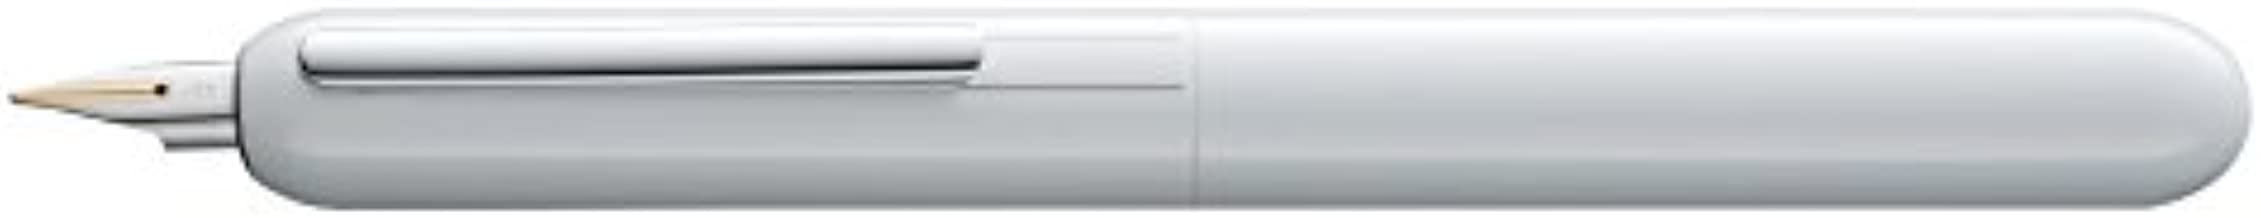 Lamy Dialog 3 Piano White Extra Fine Point Fountain Pen